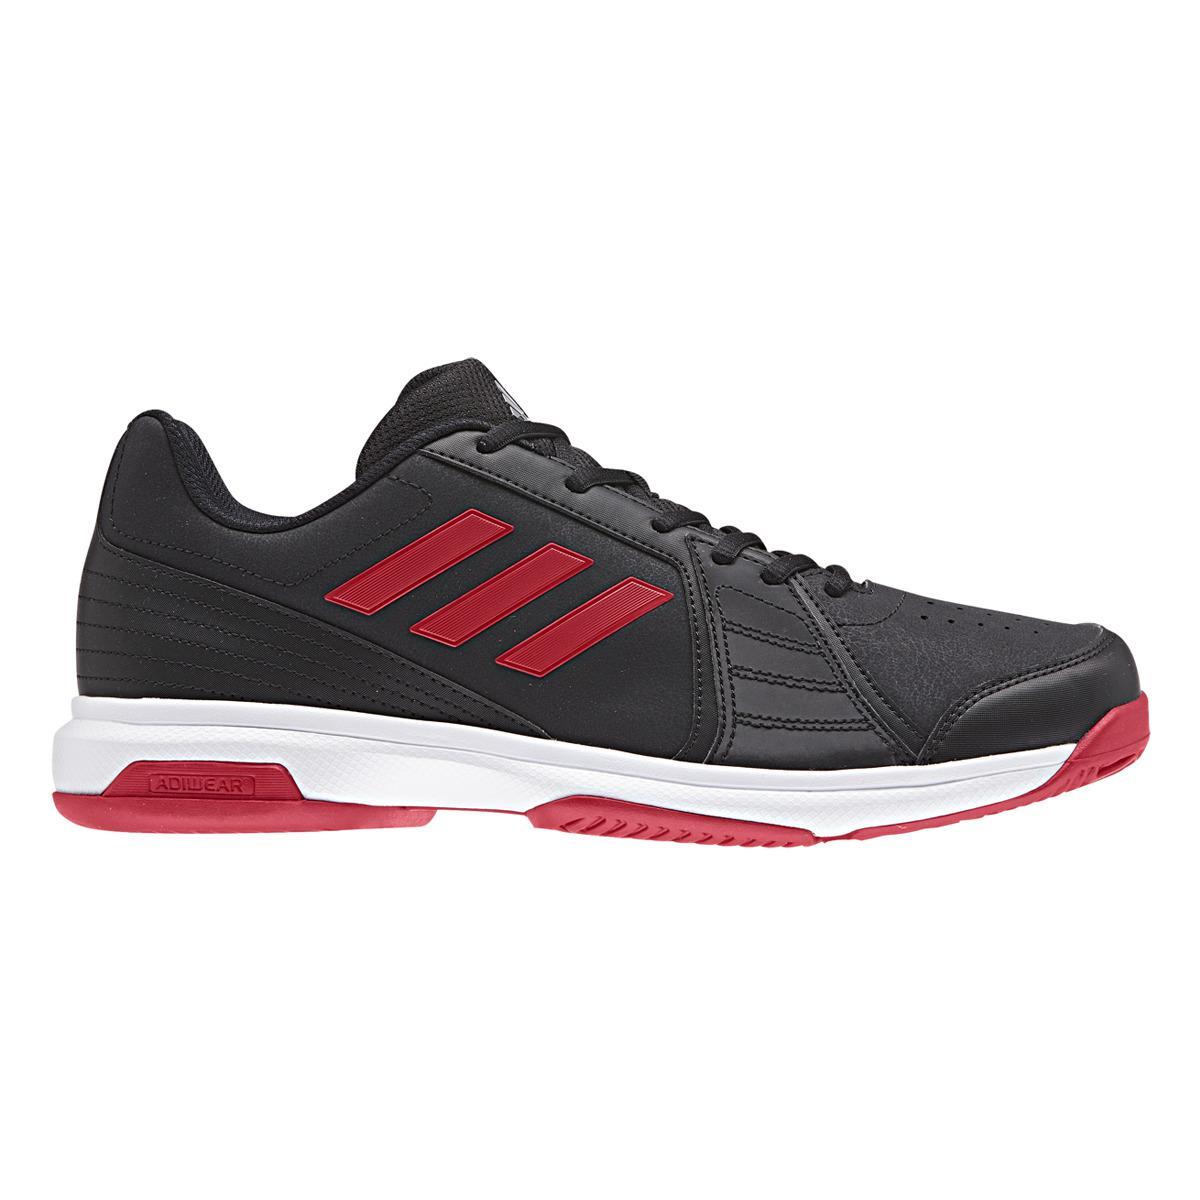 Approach Tennispaddle Tennis Shoes